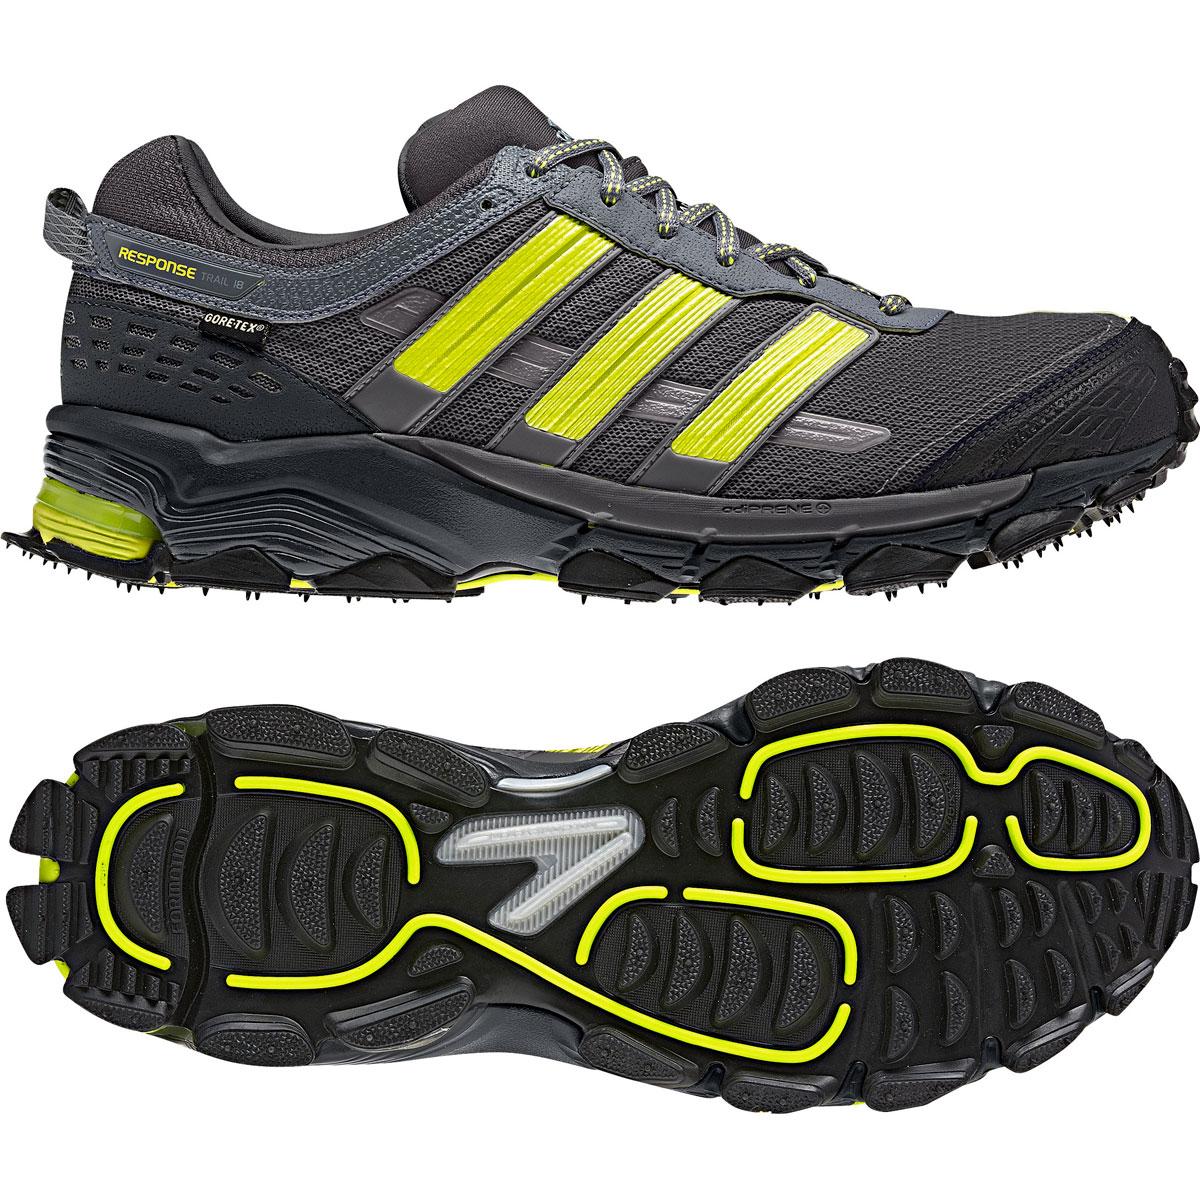 adidas response trail 18 m gtx g41223 sportschuhe running. Black Bedroom Furniture Sets. Home Design Ideas